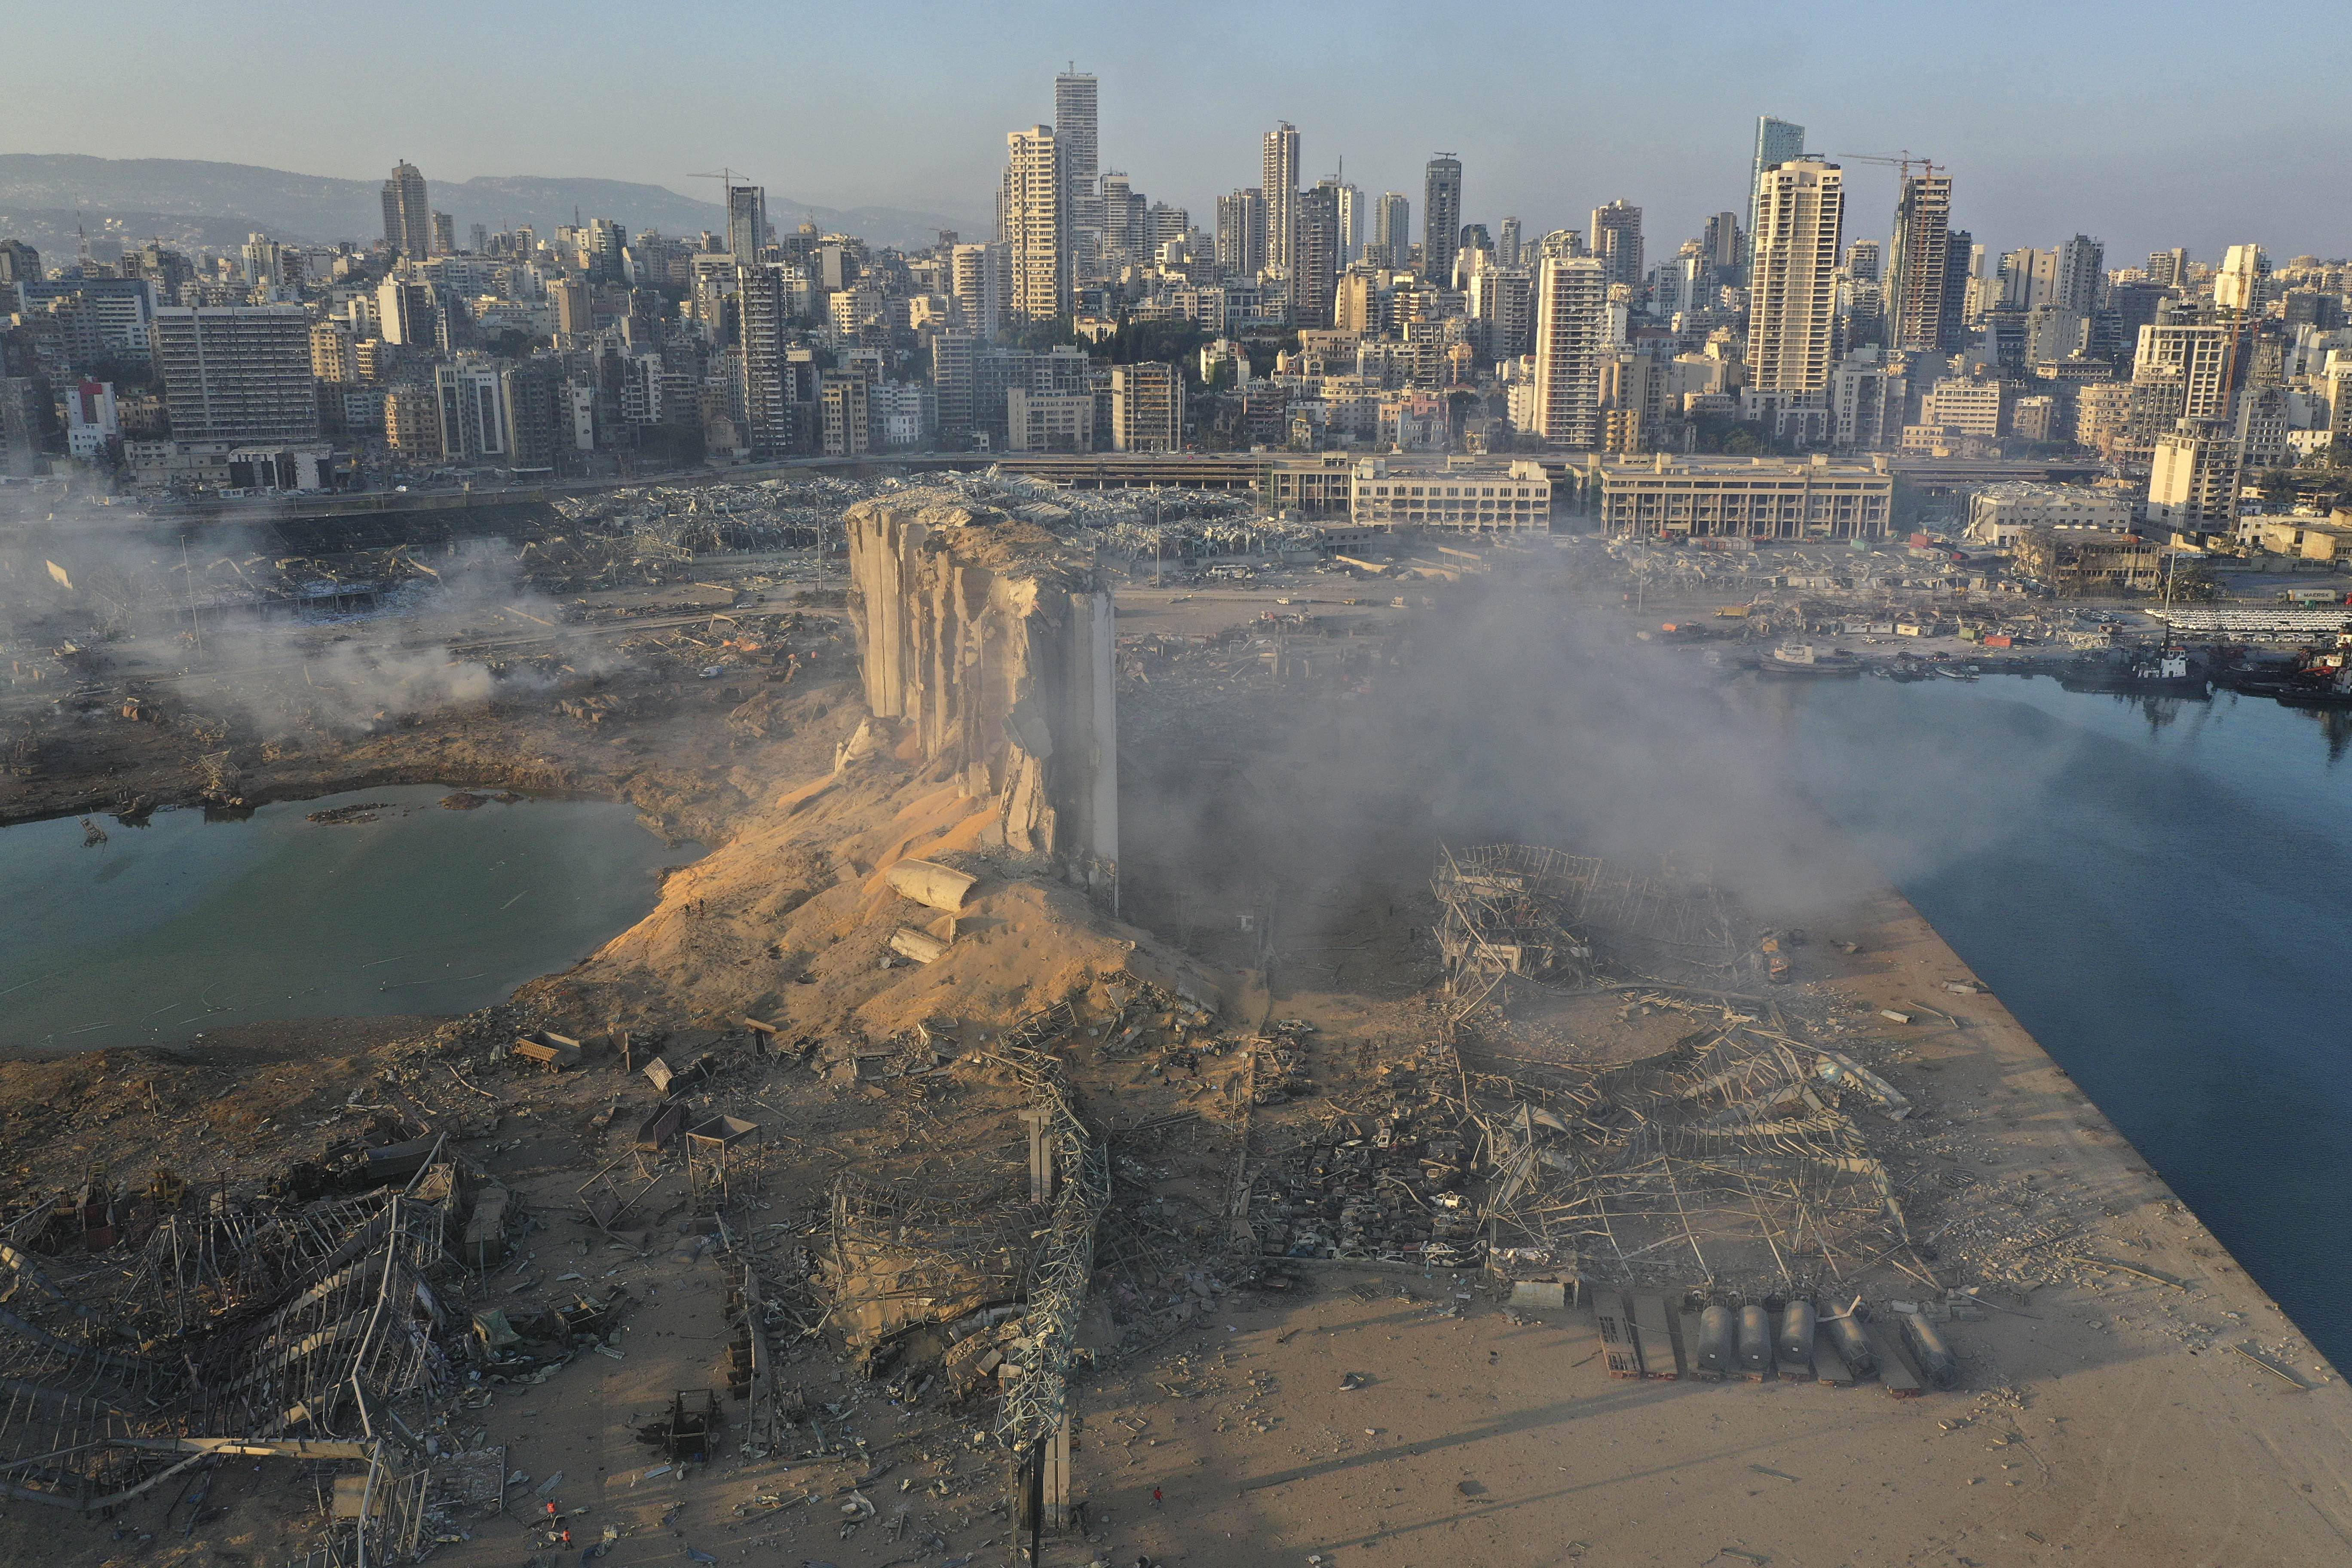 beirut-explosion-aerial-photo-lebanon-AP